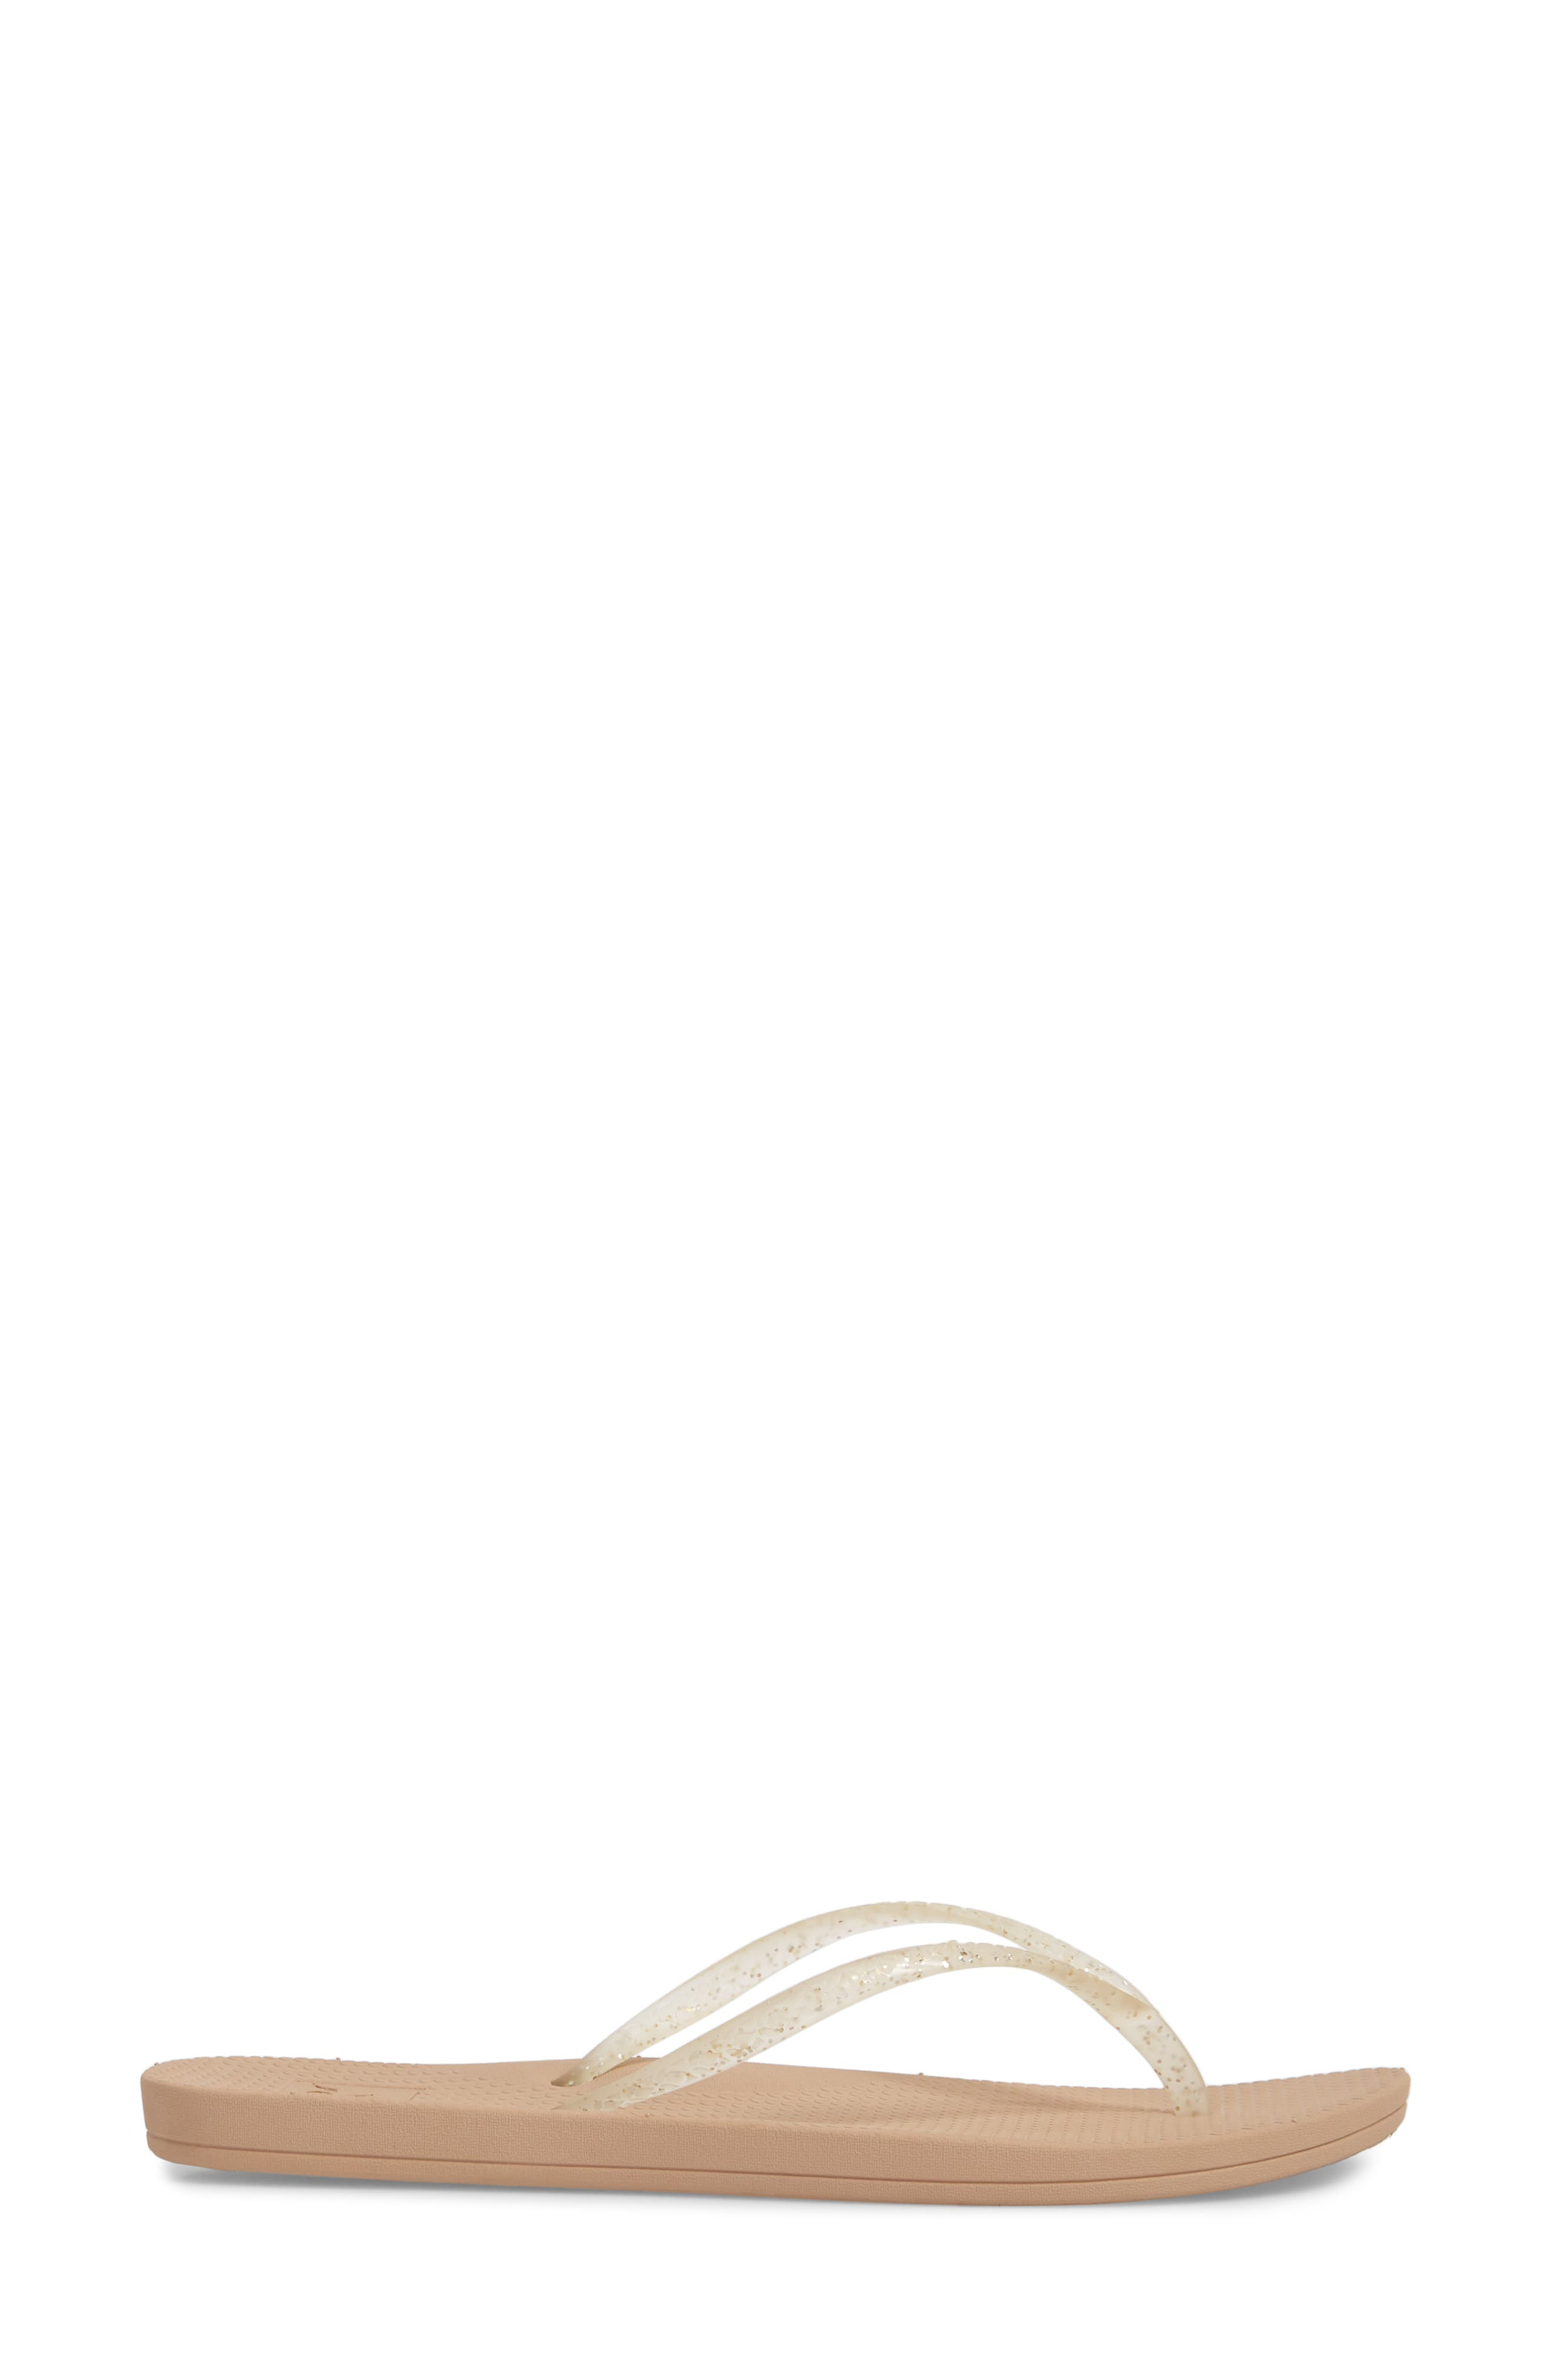 Lux Shimmer Flip Flop,                             Alternate thumbnail 3, color,                             CHAMPAGNE